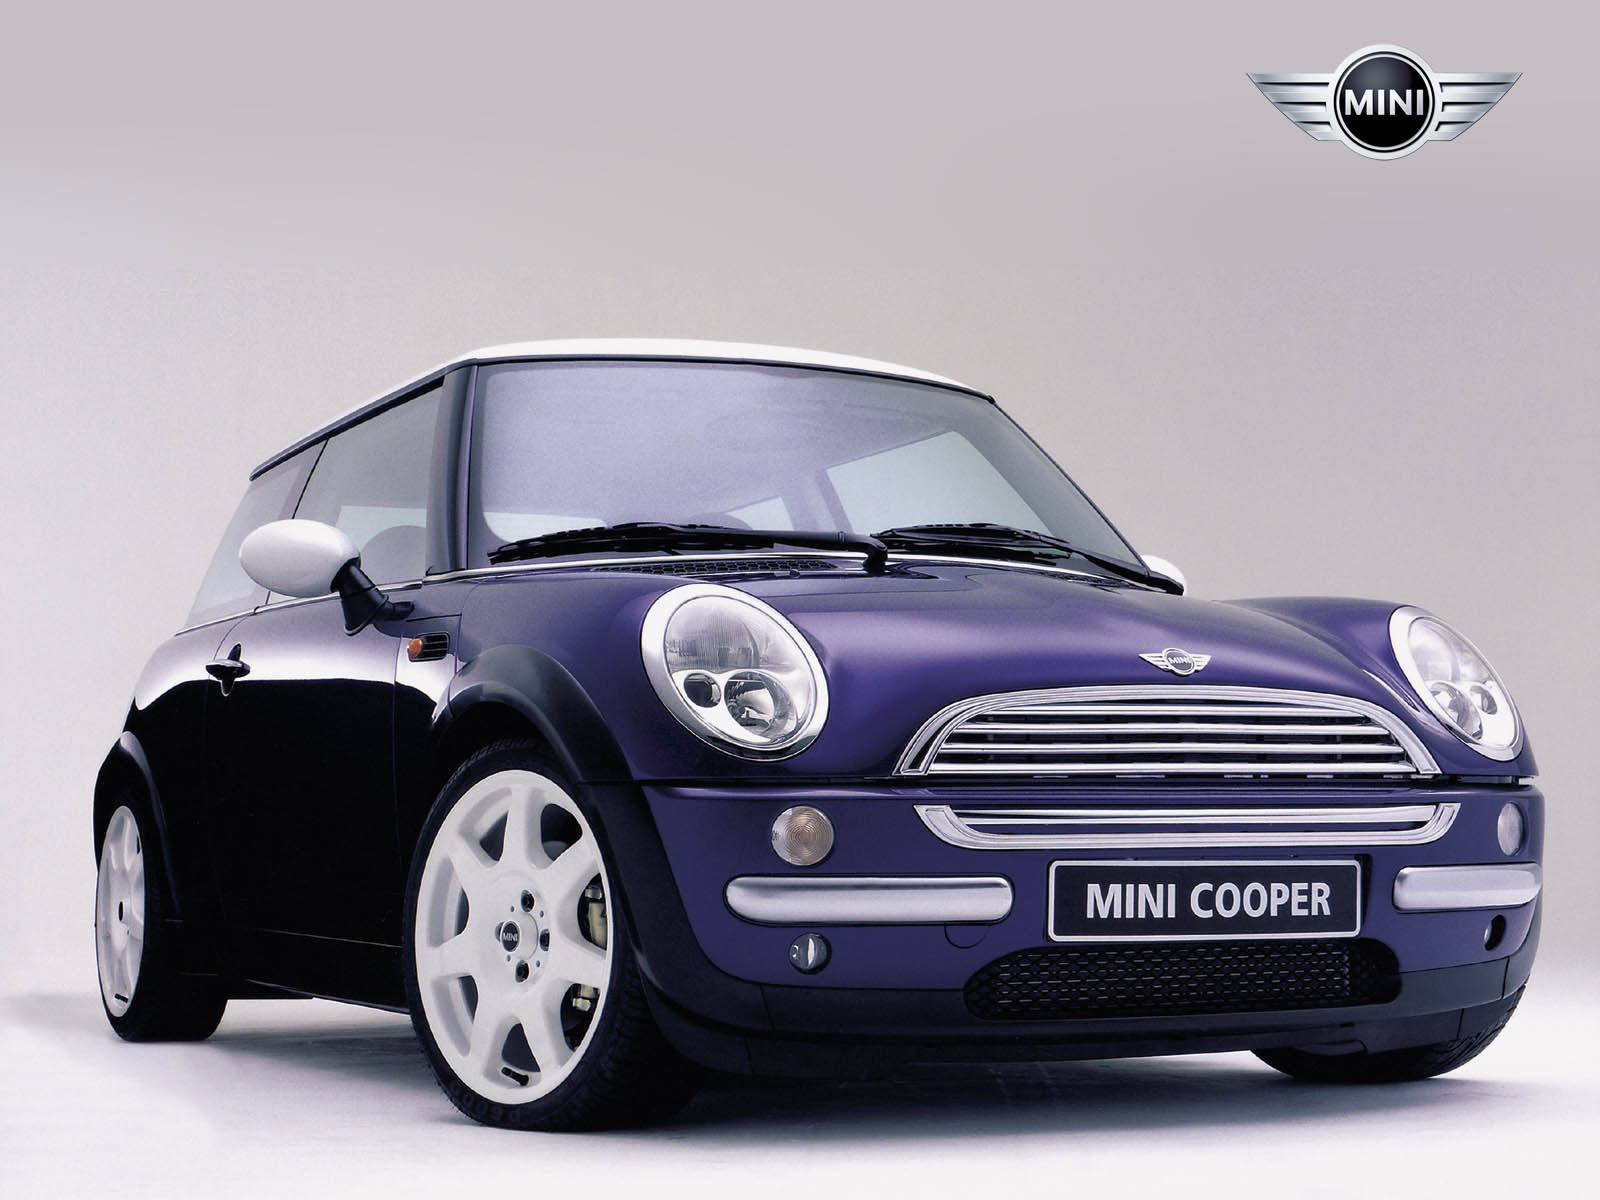 hot car models 2011 bmw mini cooper. Black Bedroom Furniture Sets. Home Design Ideas